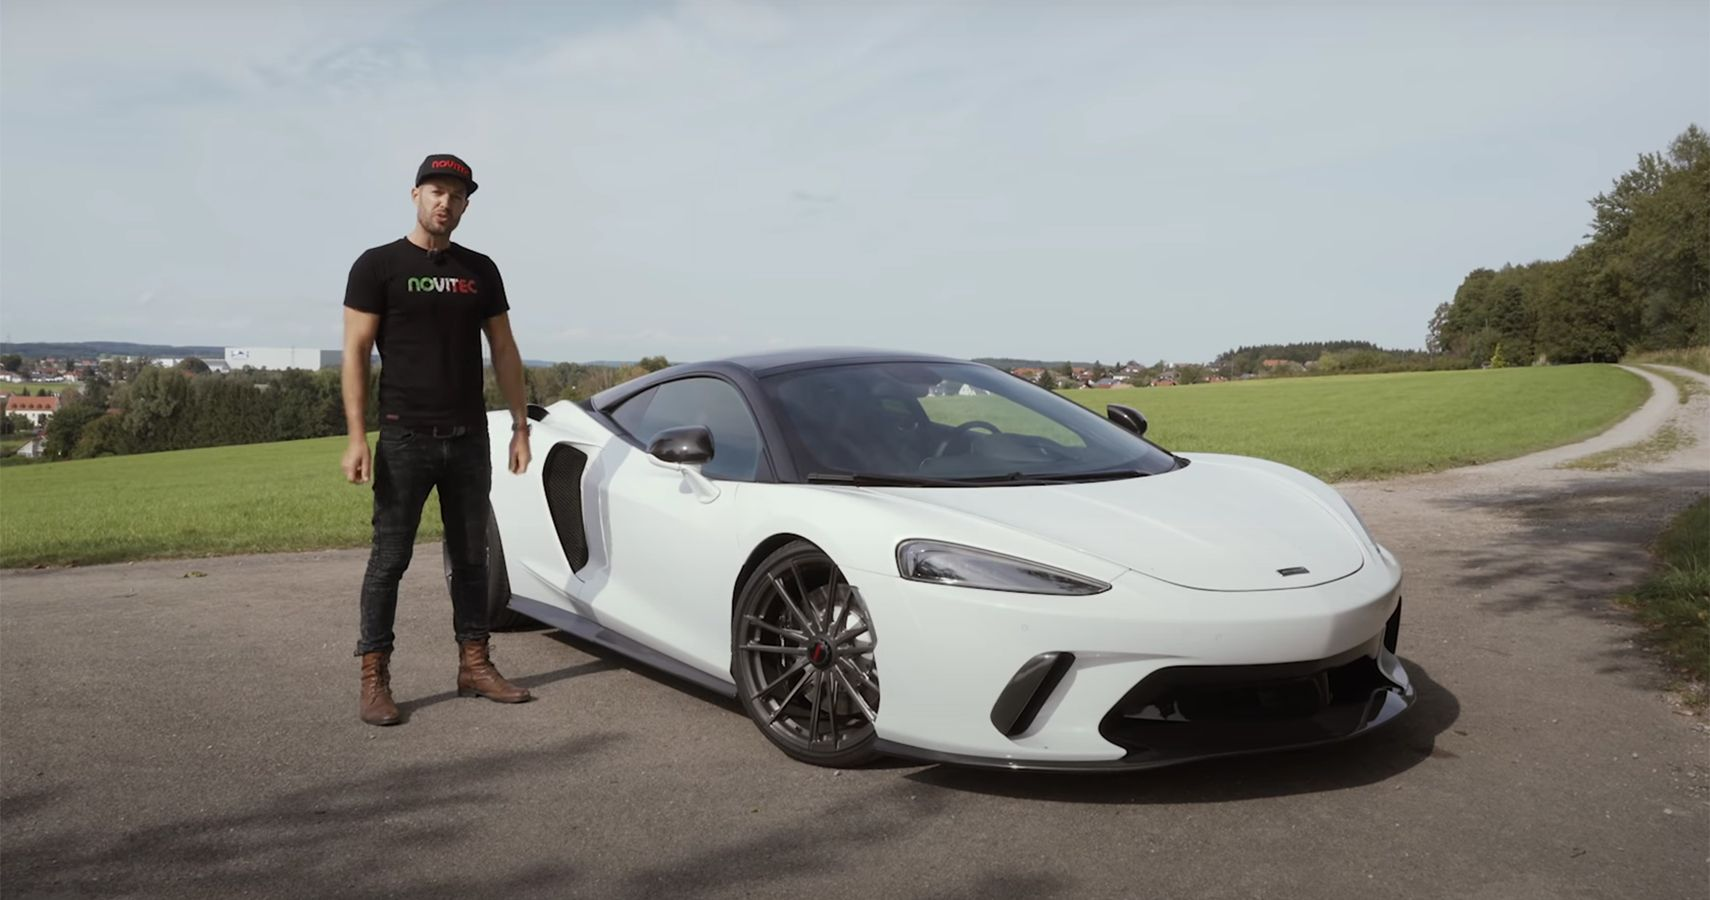 Novitec Highlights Its McLaren GT With Enhanced Aesthetics And Aerodynamics In New Video